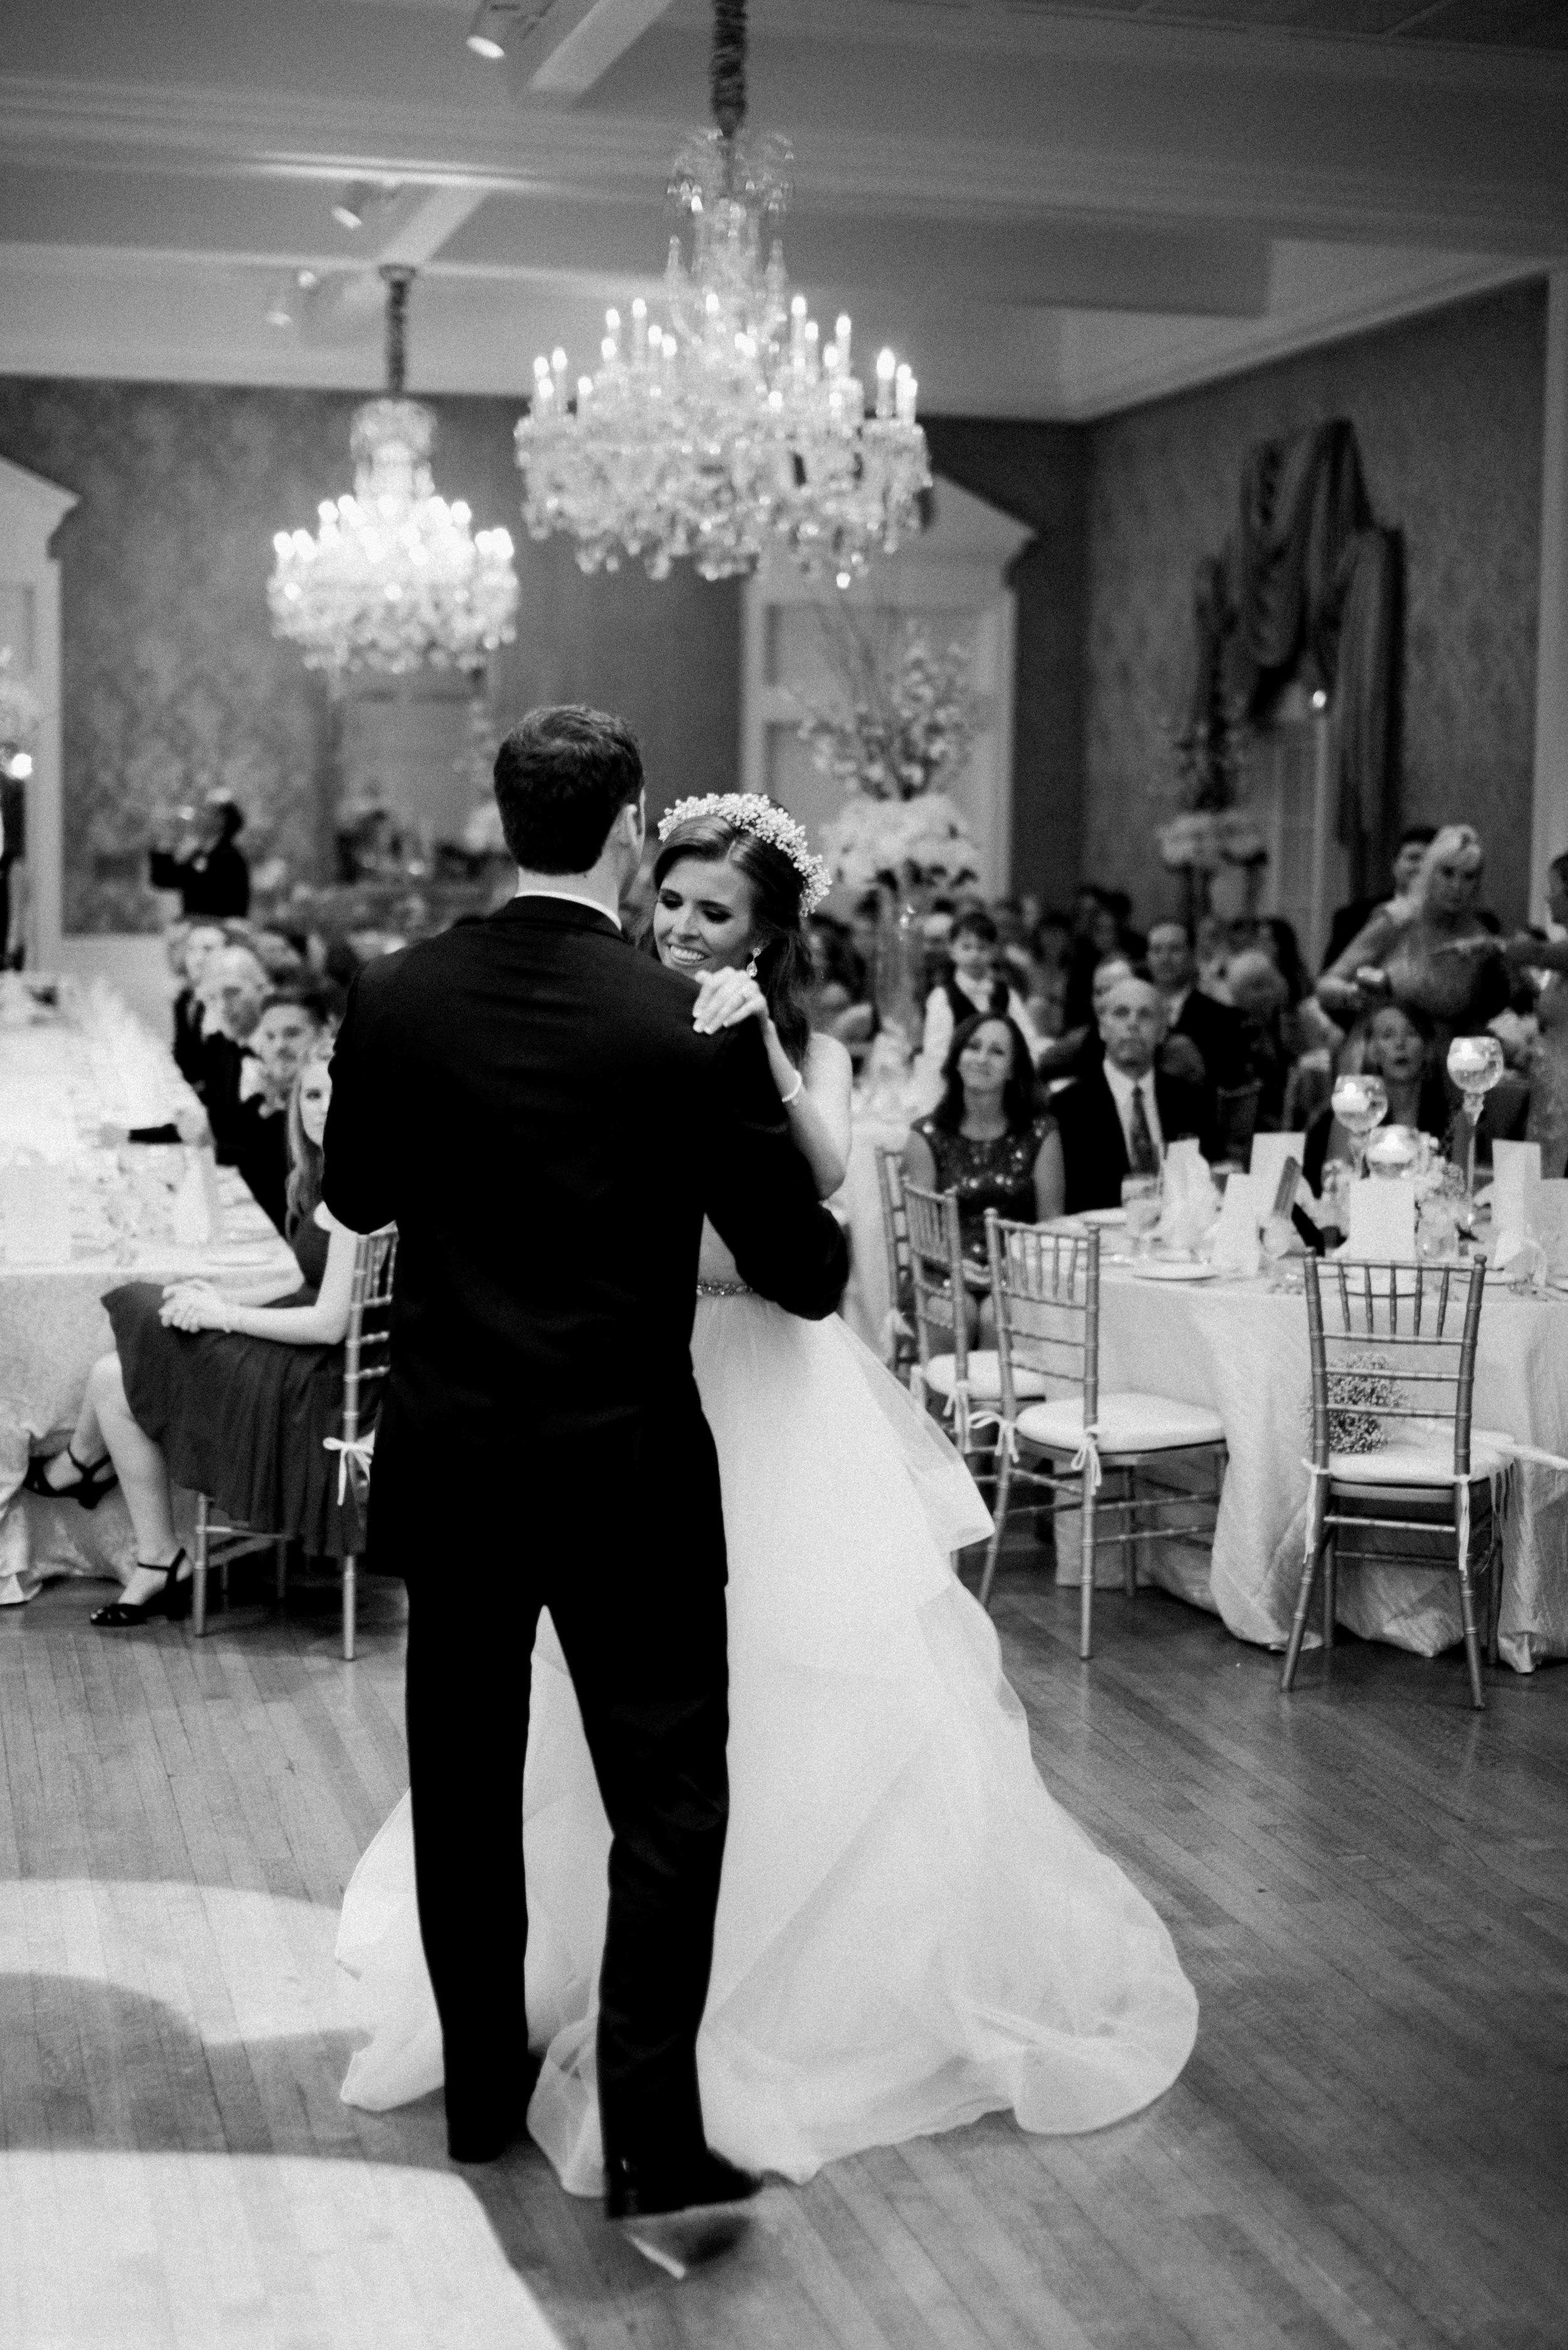 Dana-Fernandez-Photography-Weddings-in-Houston-Magazine-feature-Houston-wedding-photographer-film-41.jpg